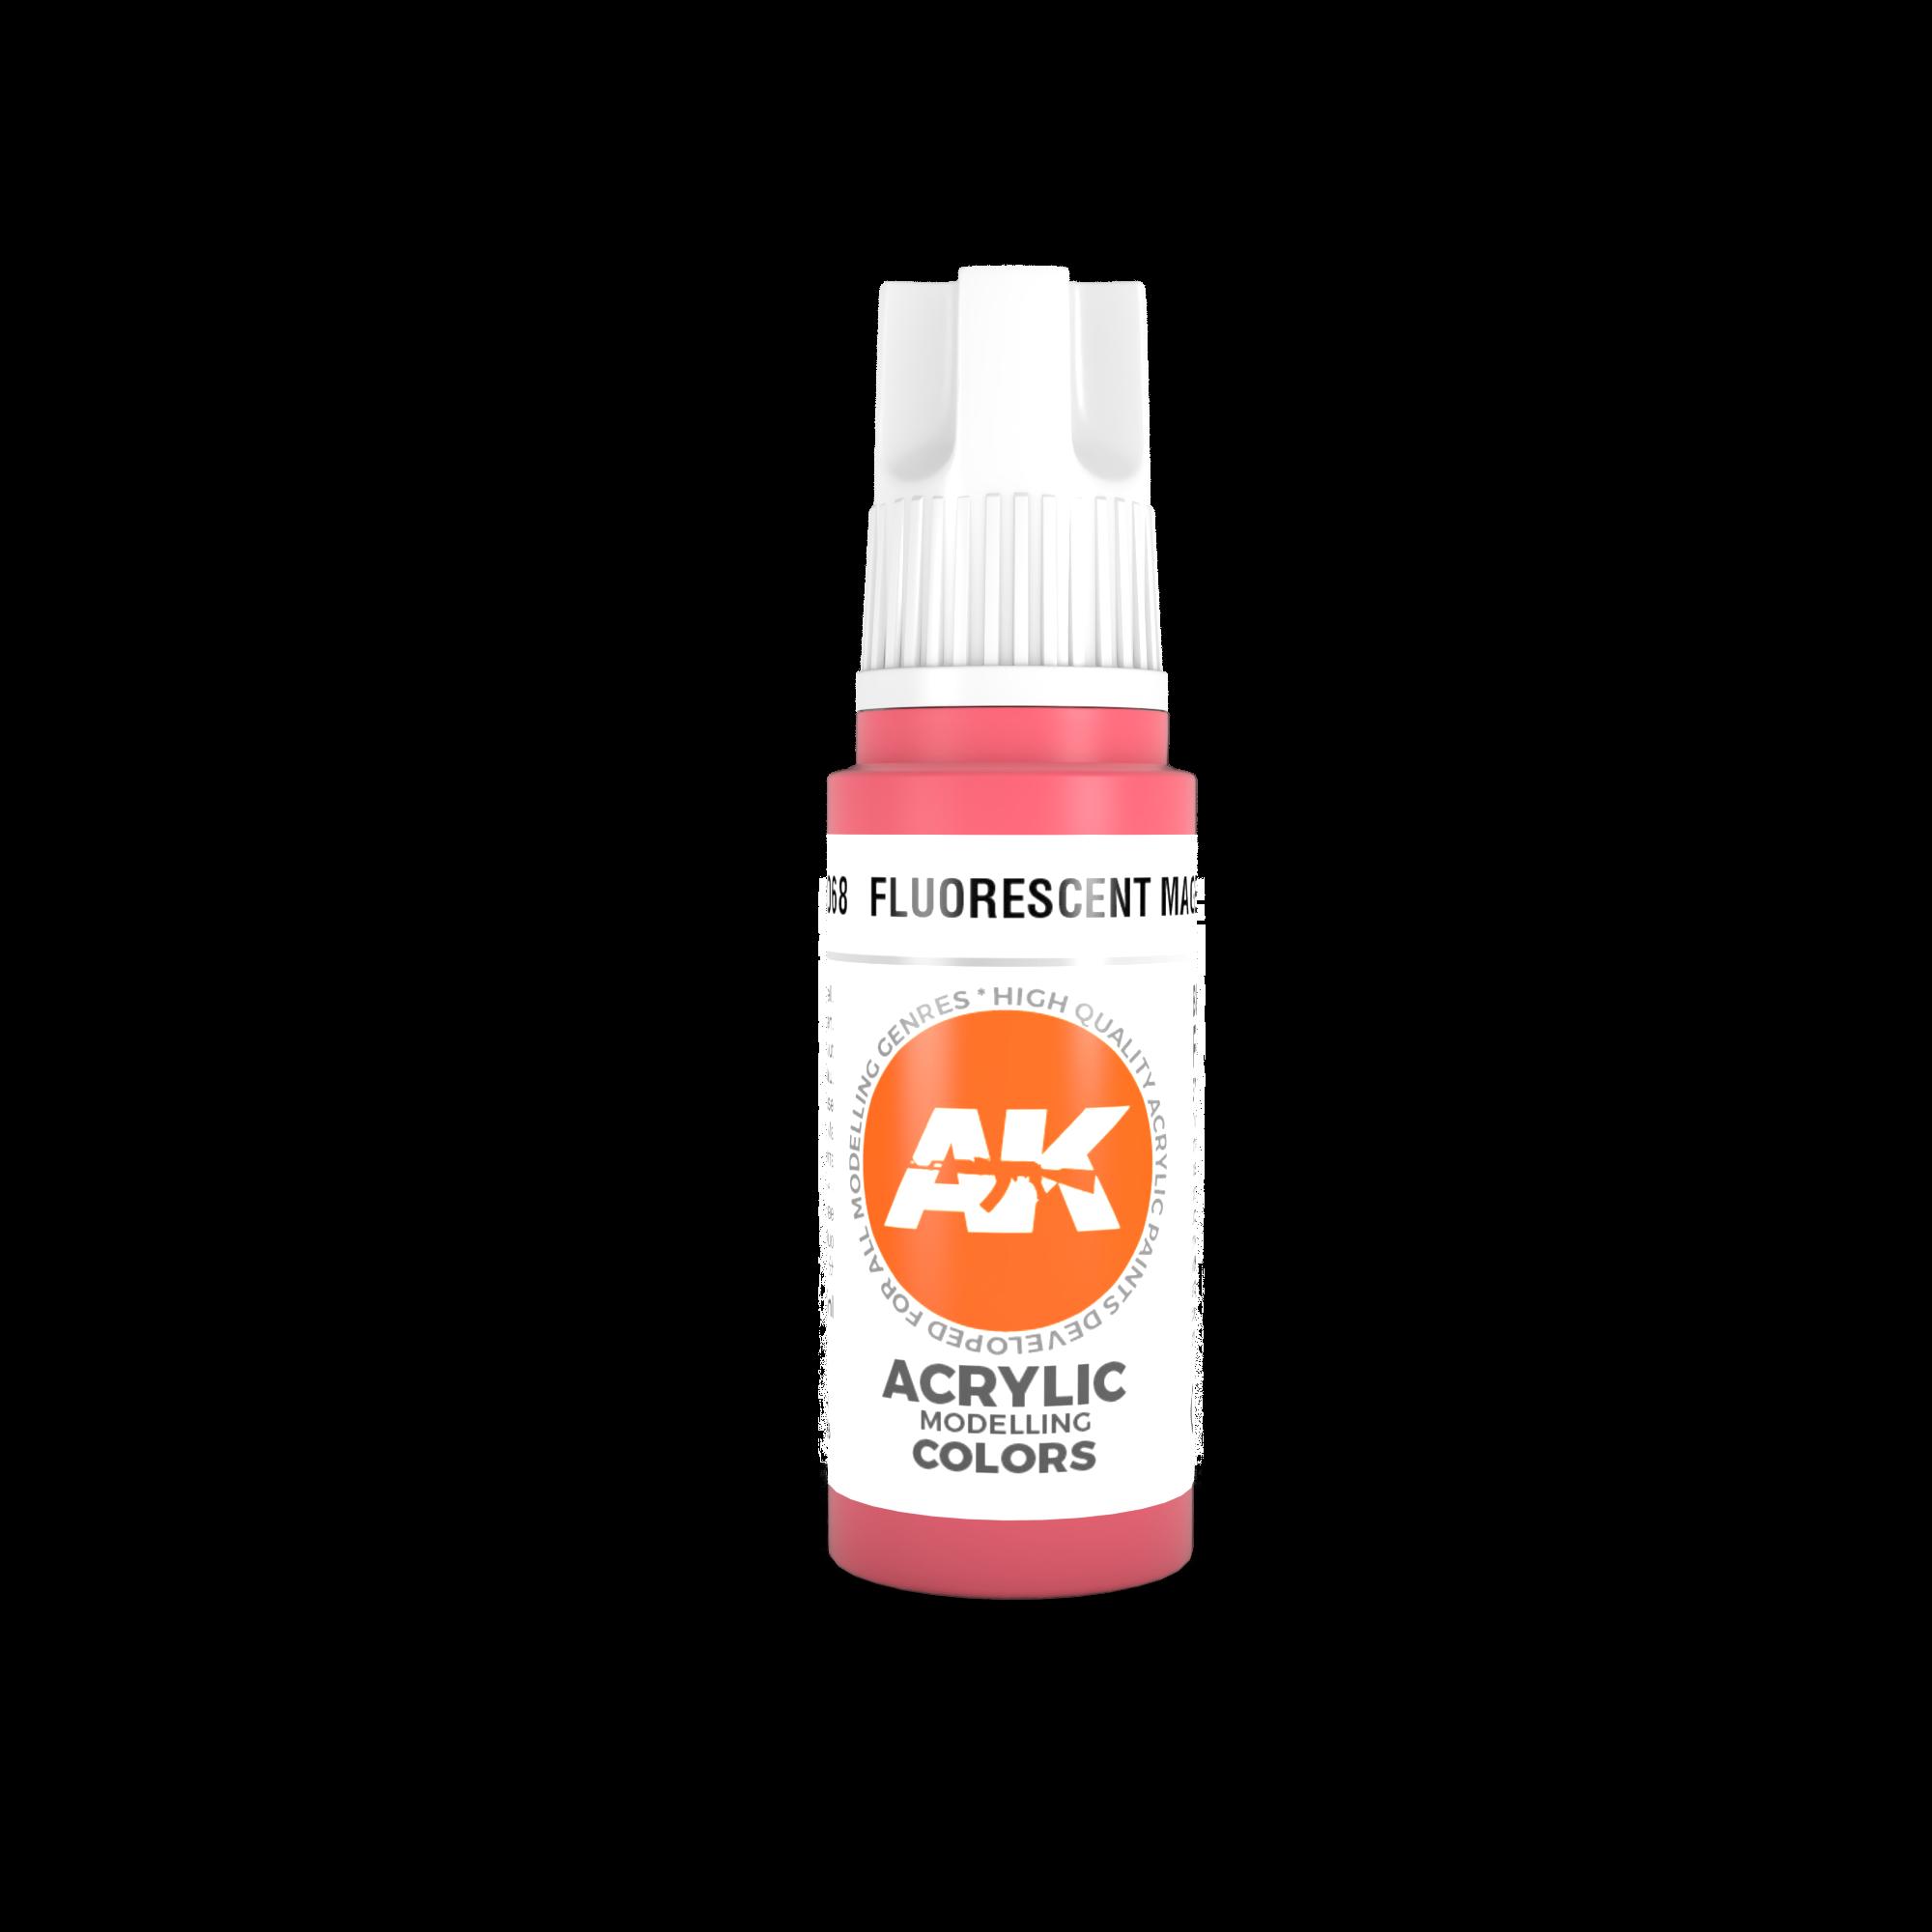 AK-Interactive Fluorescent Magenta Acrylic Modelling Color - 17ml - AK-11068